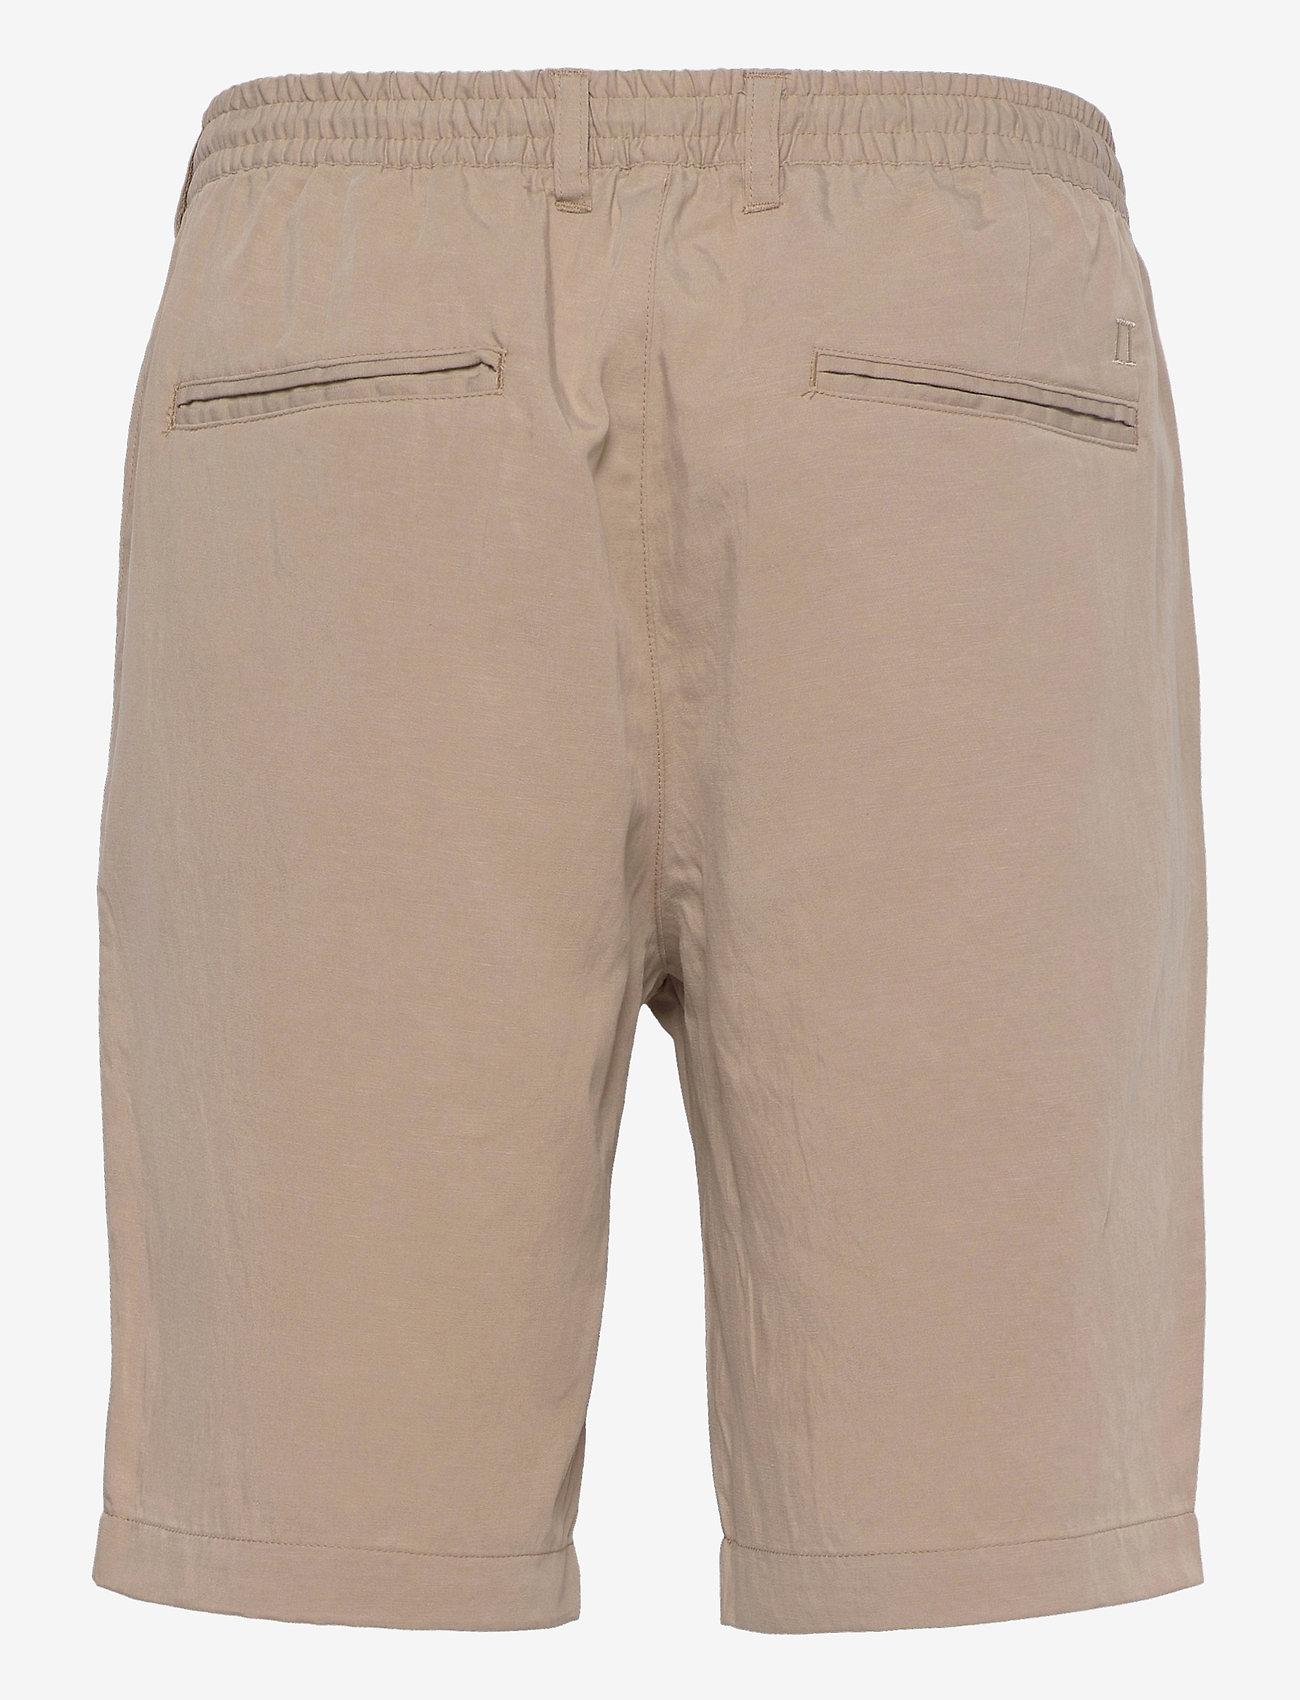 Les Deux - Pino Linen-Tencel Shorts - chino's shorts - dark sand - 1